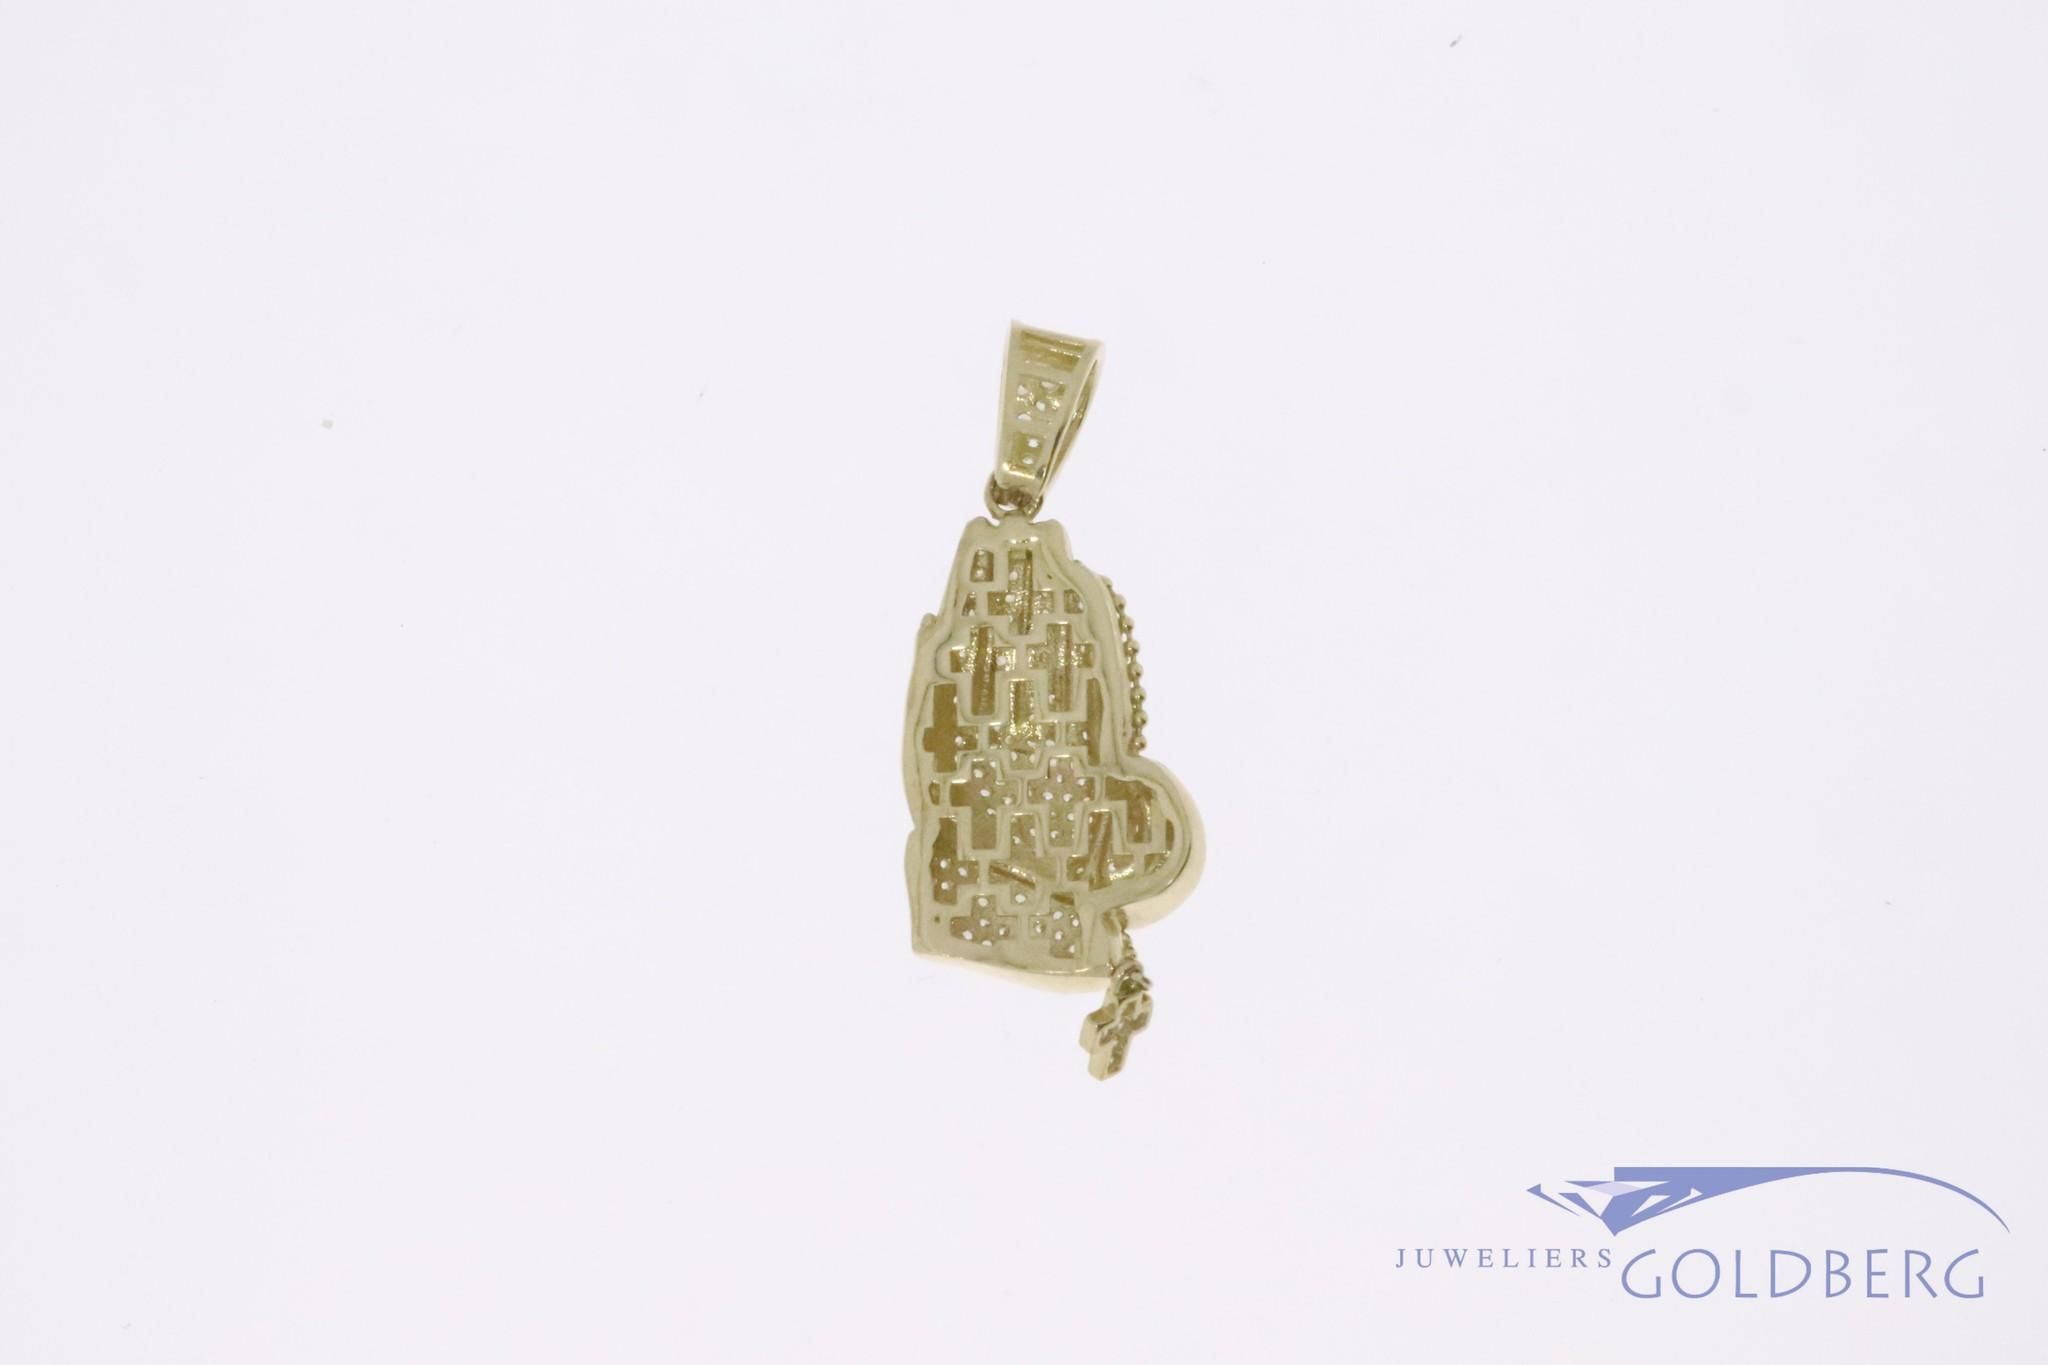 14k gold praying hands pendant with zirconia's